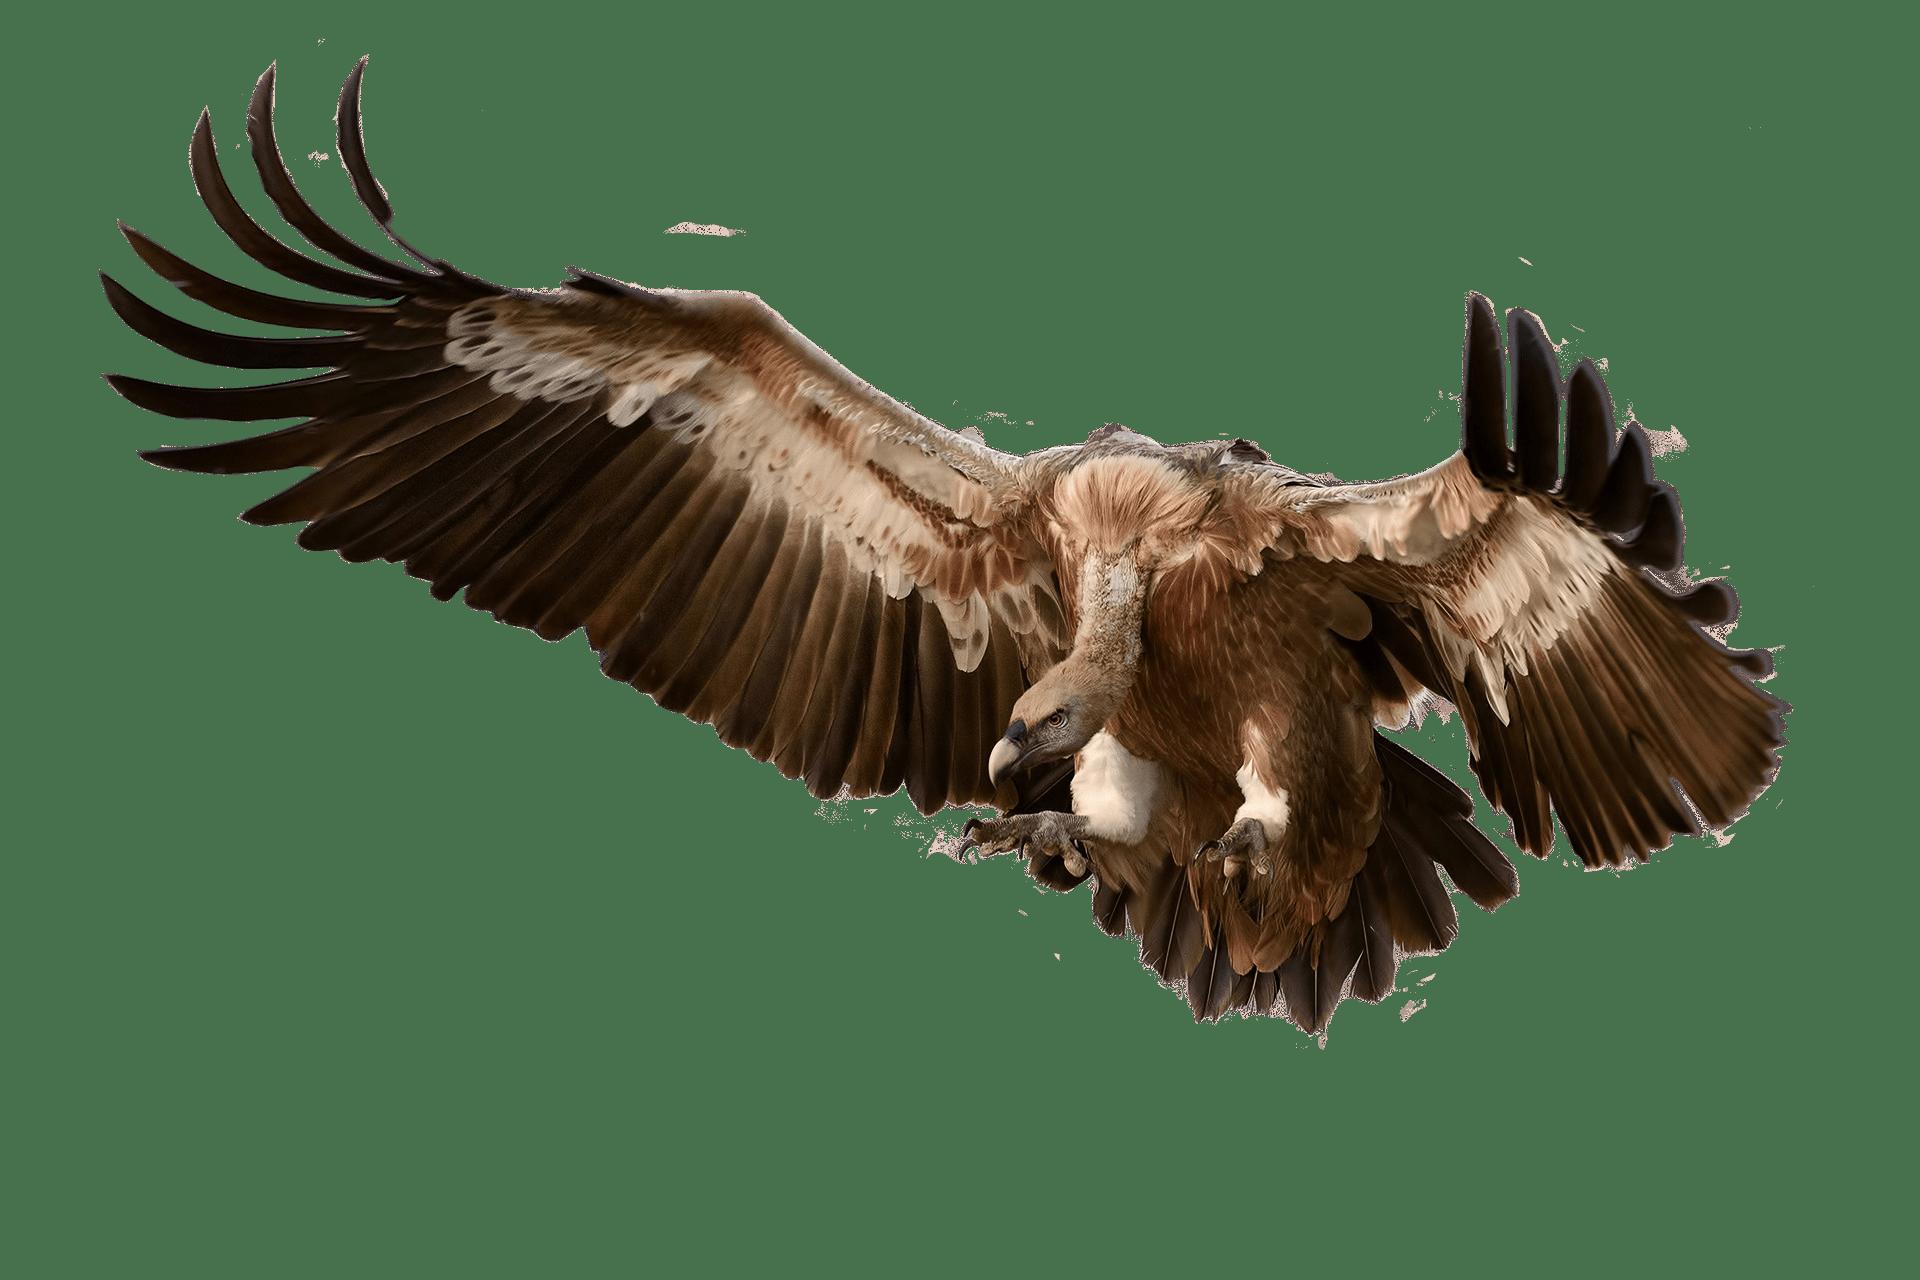 vulture attacking its prey transparent png stickpng